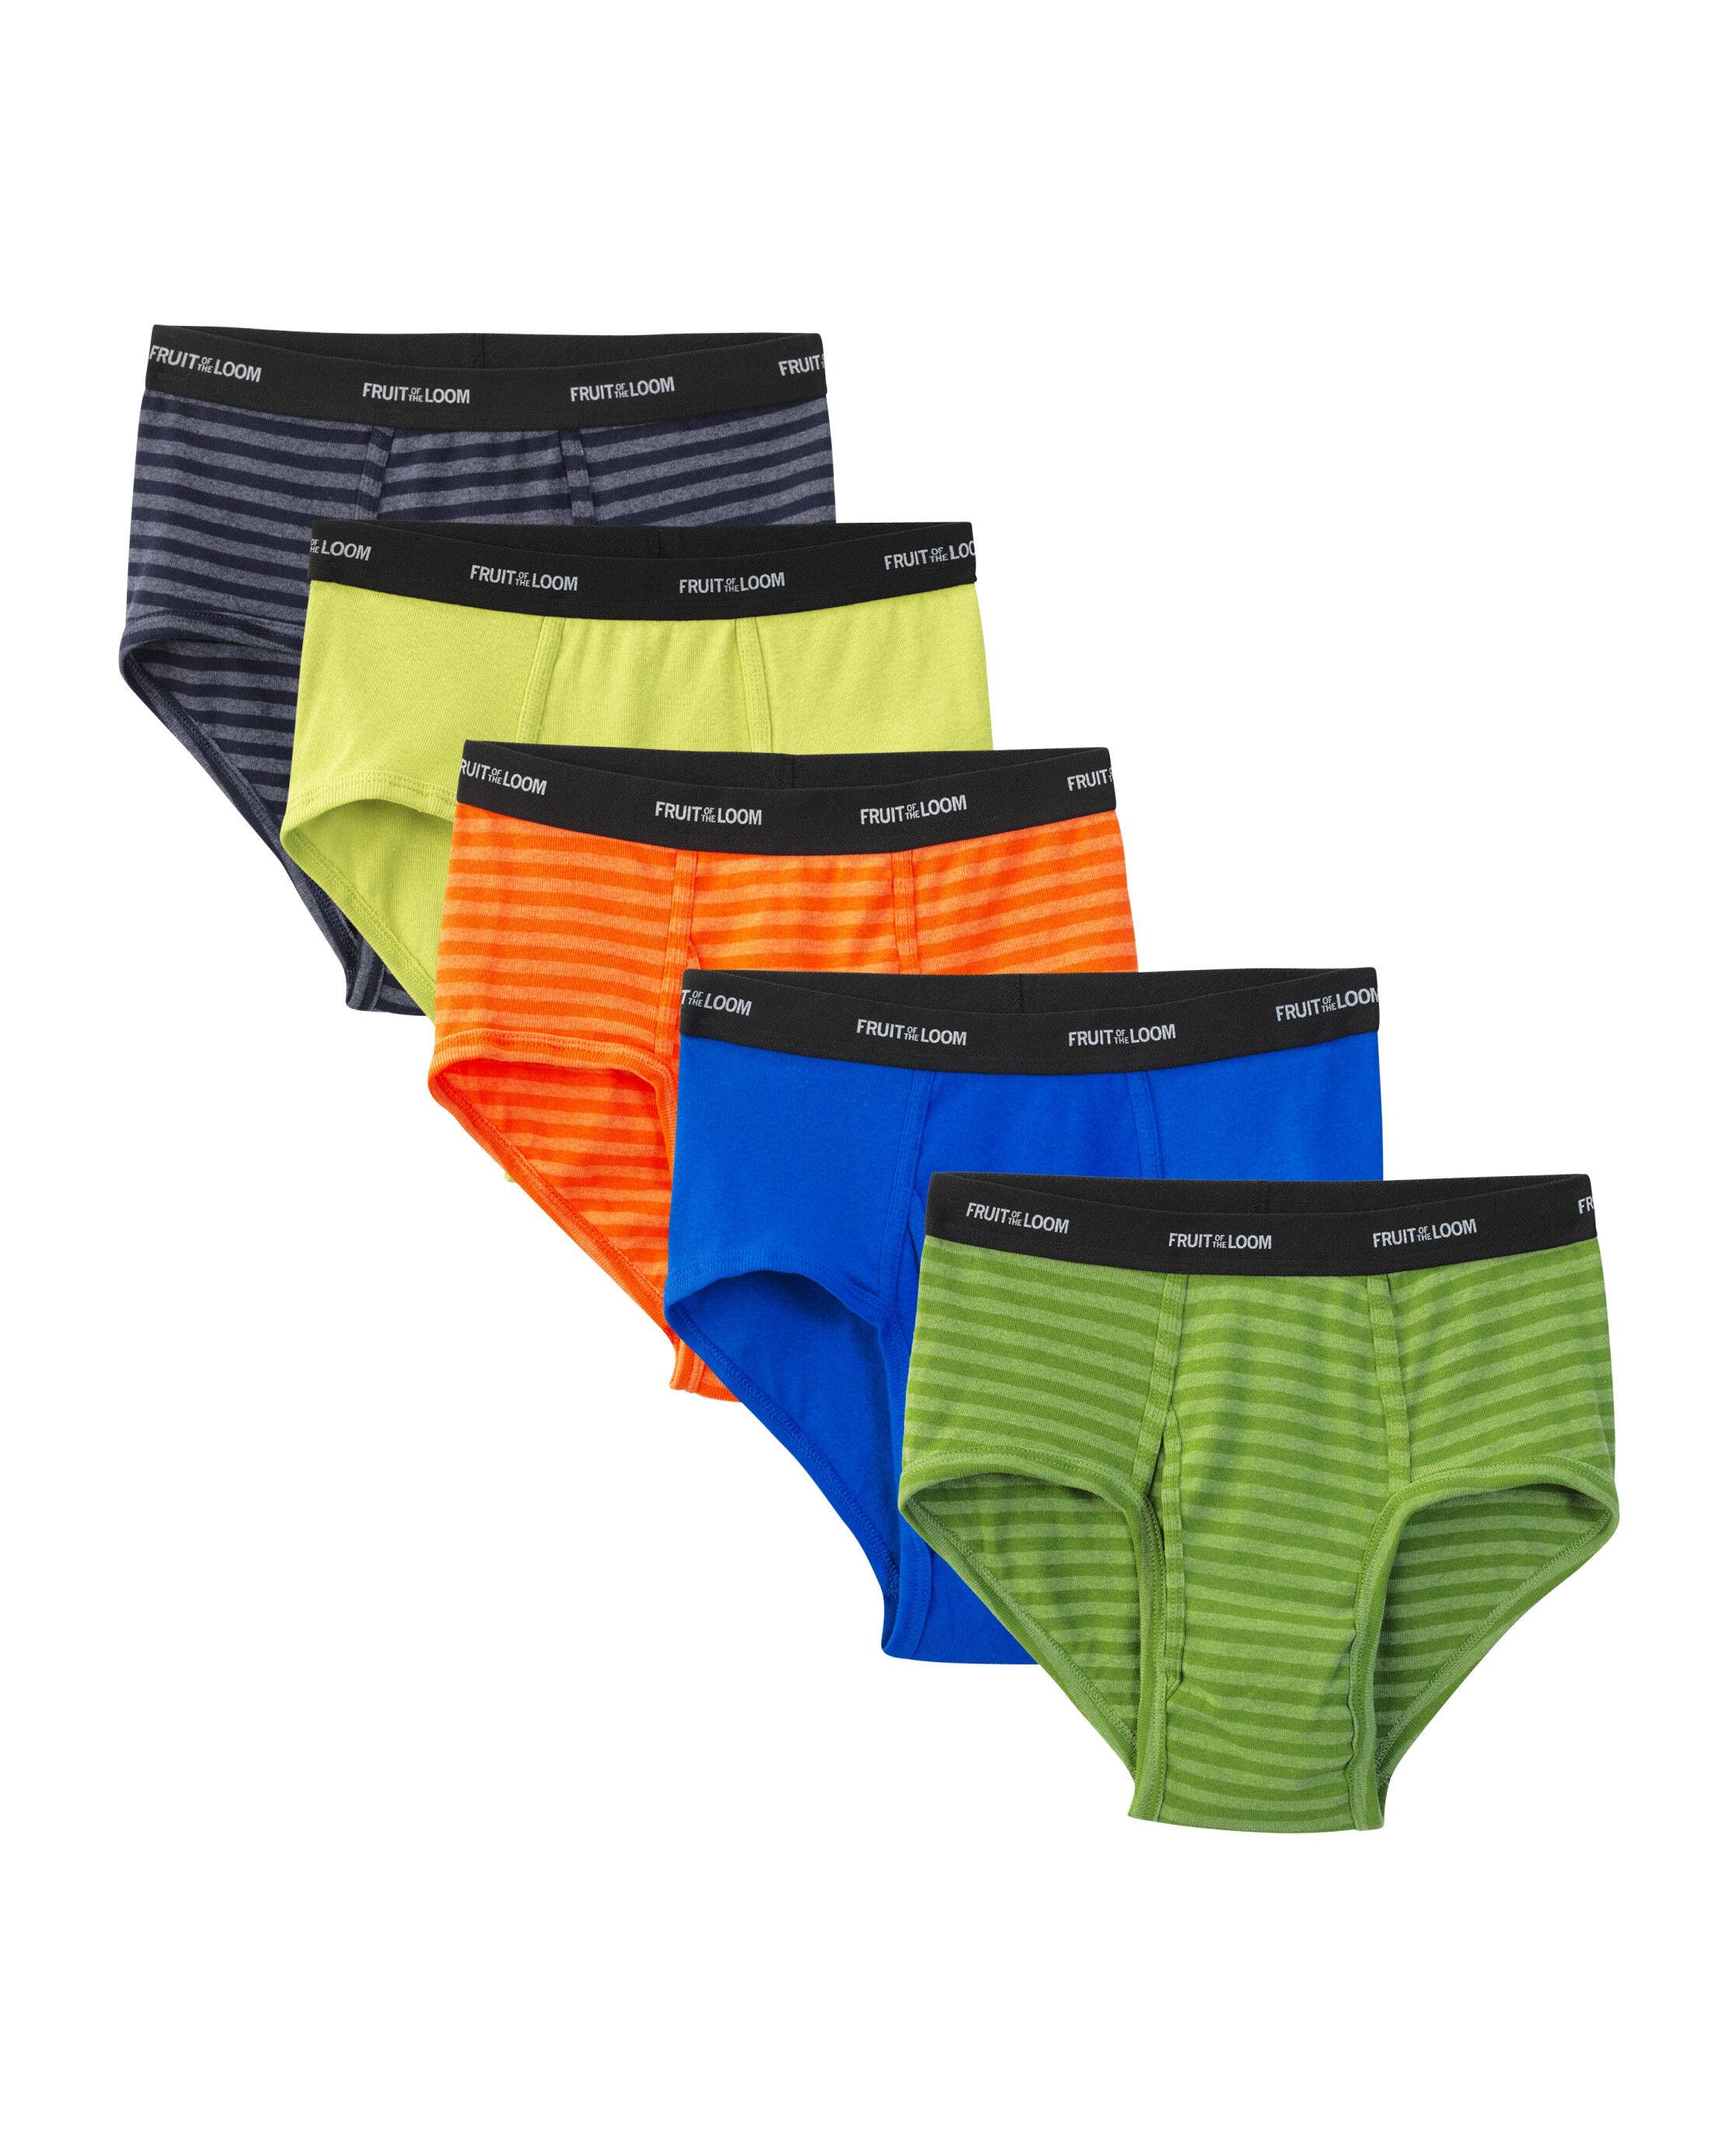 Men' 5 Pack Stripes Solids Fashion Briefs Extended Sizes - Fruit